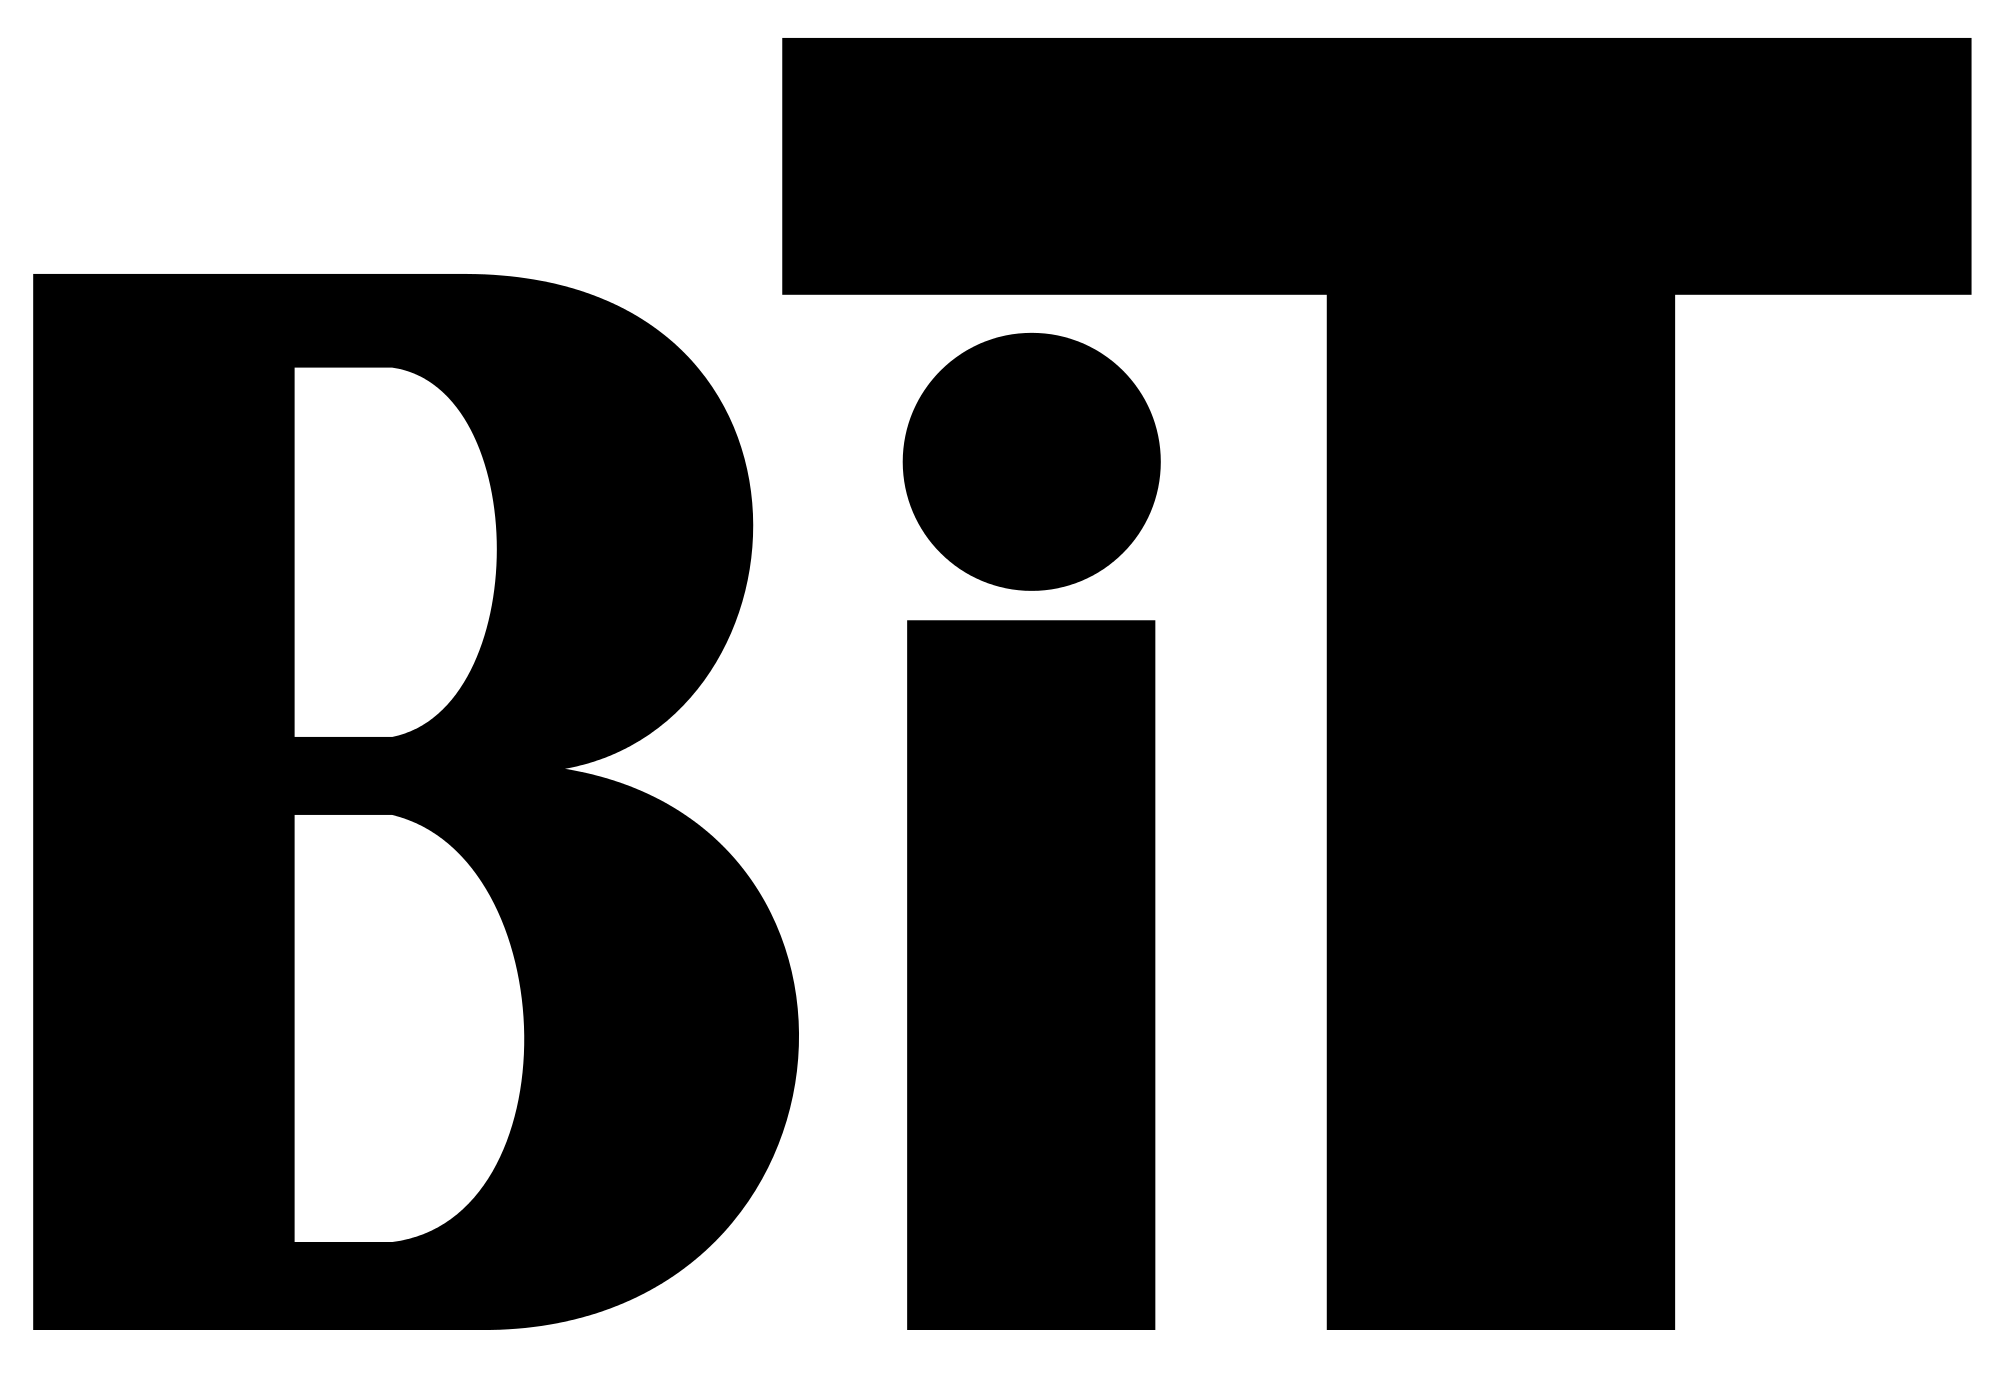 Bit png 1 » PNG Image.